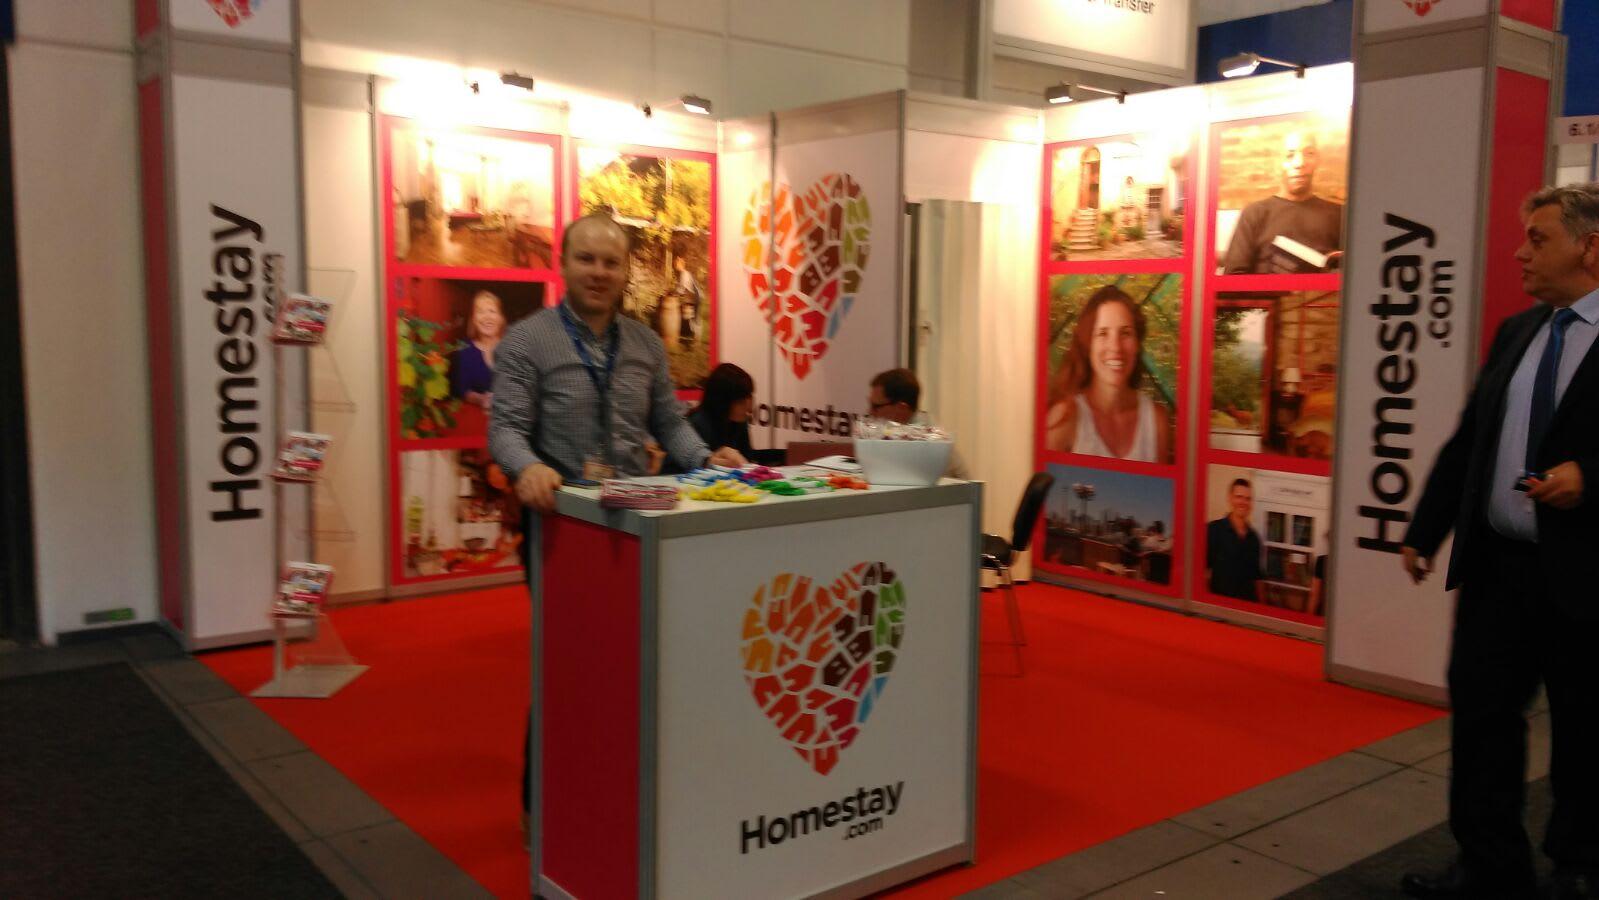 Homestay_ITB_Stall_Design_e420e7f8-4f6d-4596-a8fe-d1bc7c75f602